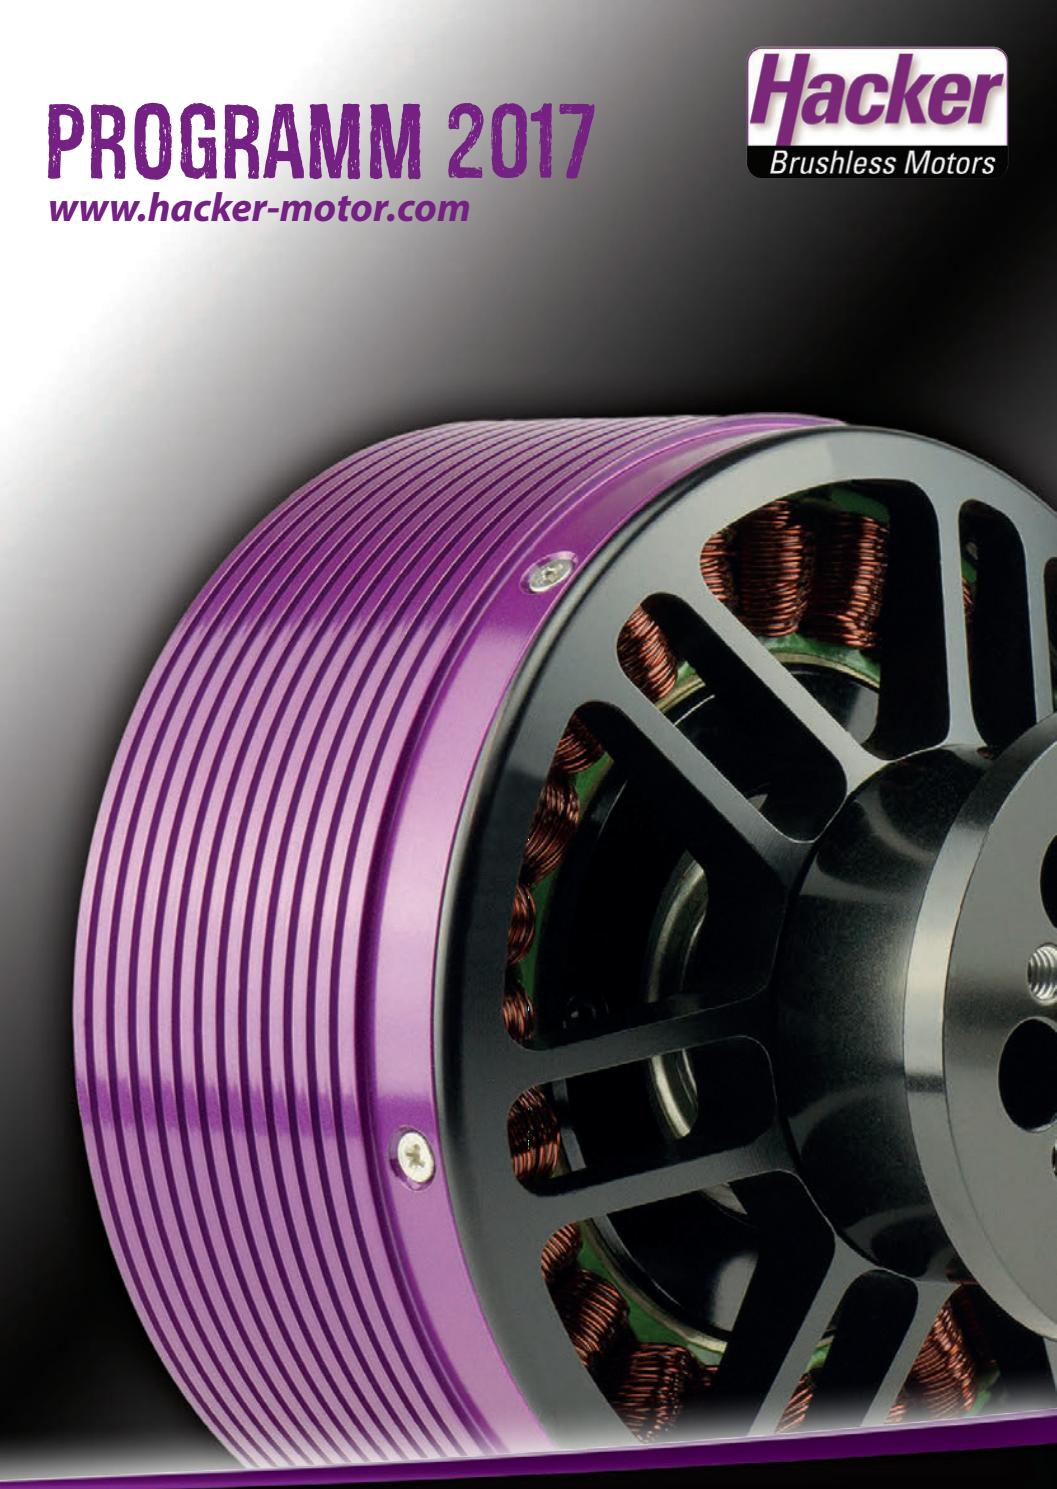 Steel Universal Drive Shaft 105mm-150mm for rc crawlers 2pcs